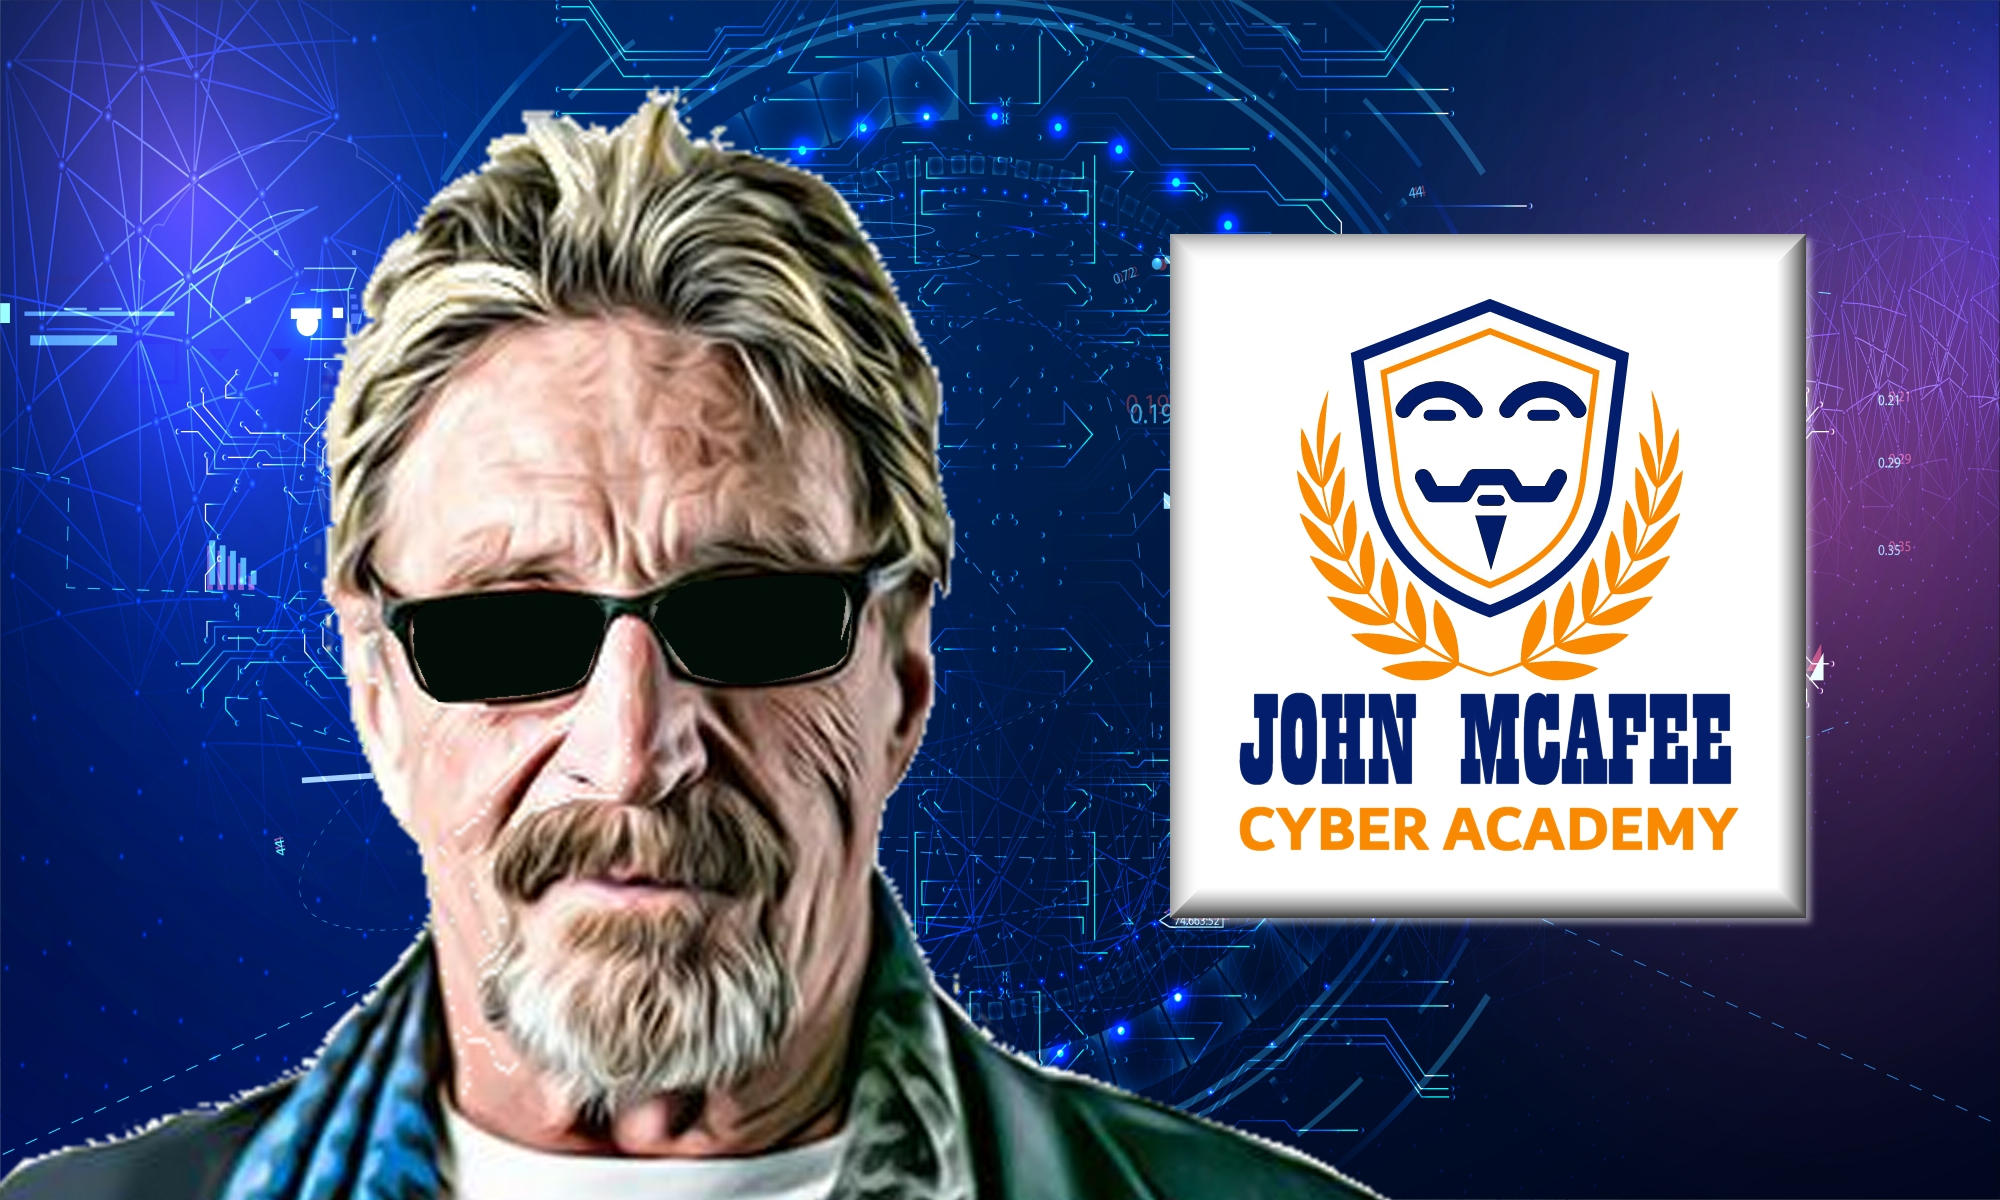 John McAfee Cyber Academy